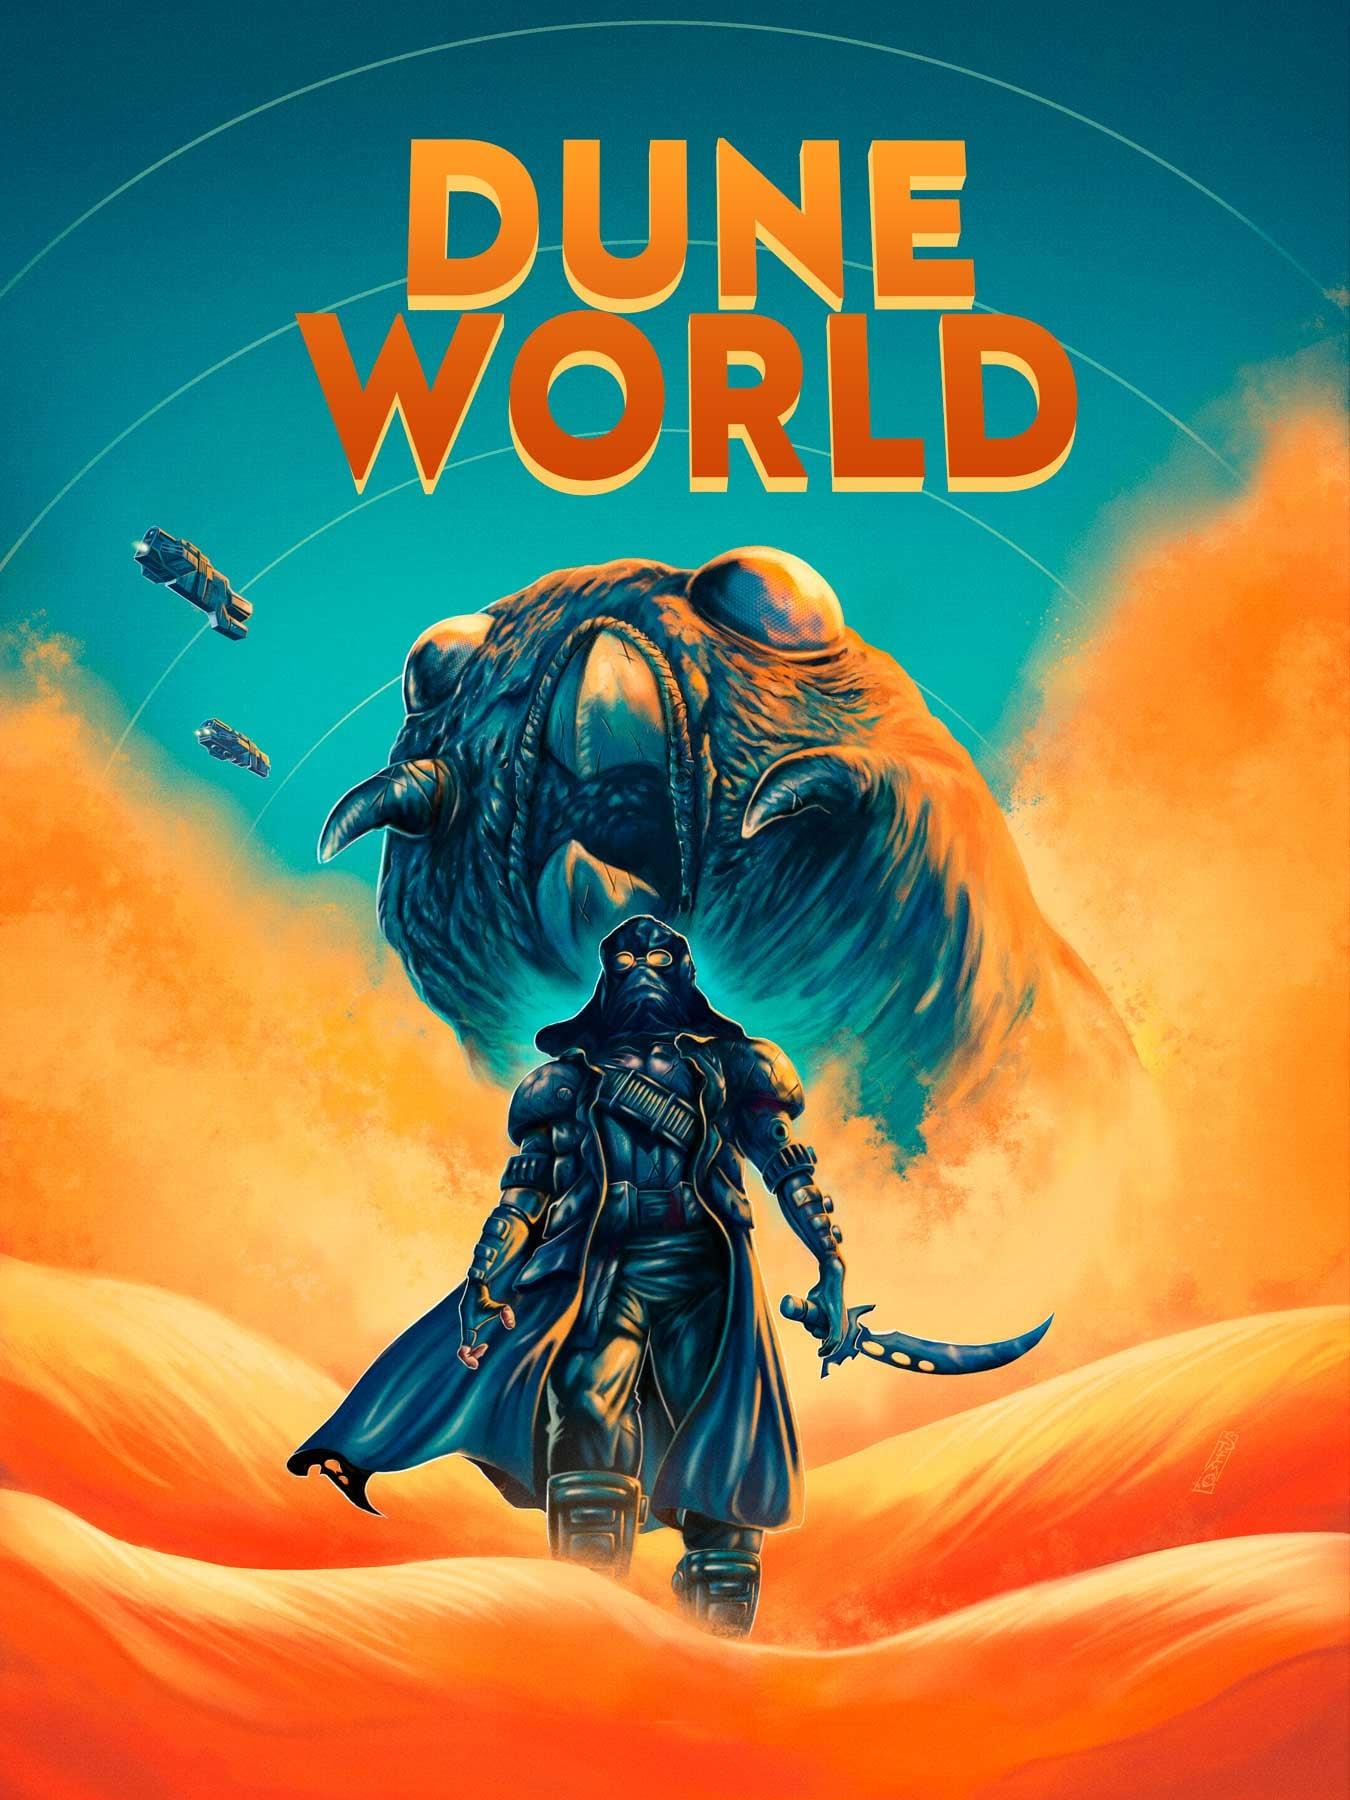 Dune World (2021) Telugu Dubbed (Voice Over) & English [Dual Audio] WebRip 720p [1XBET]